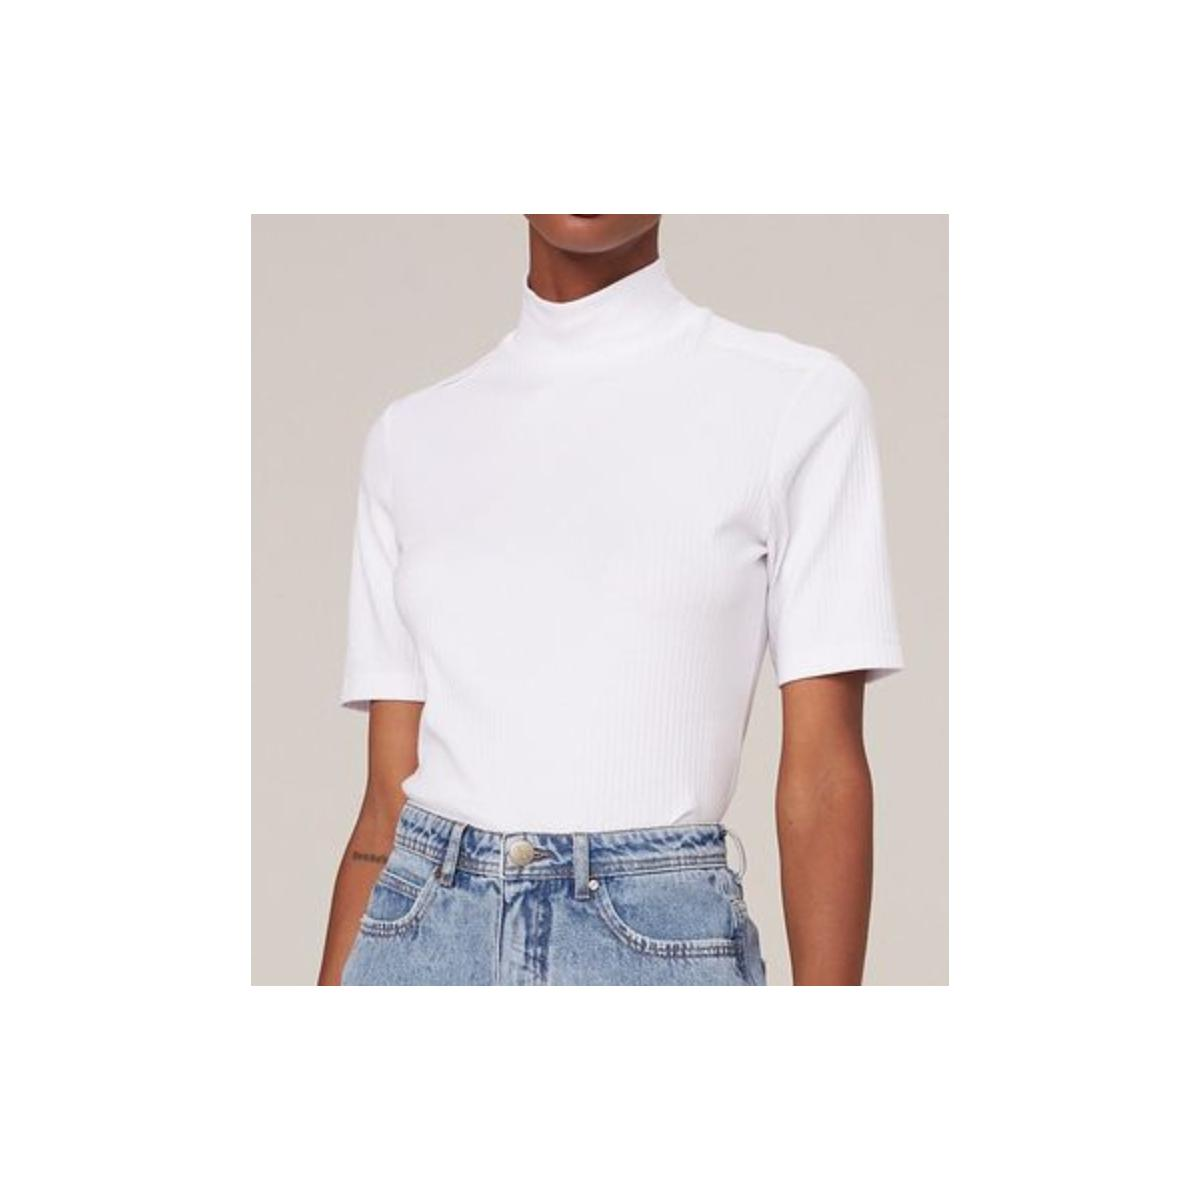 Blusa Feminina Dzarm 6rw6 N0aen  Off White